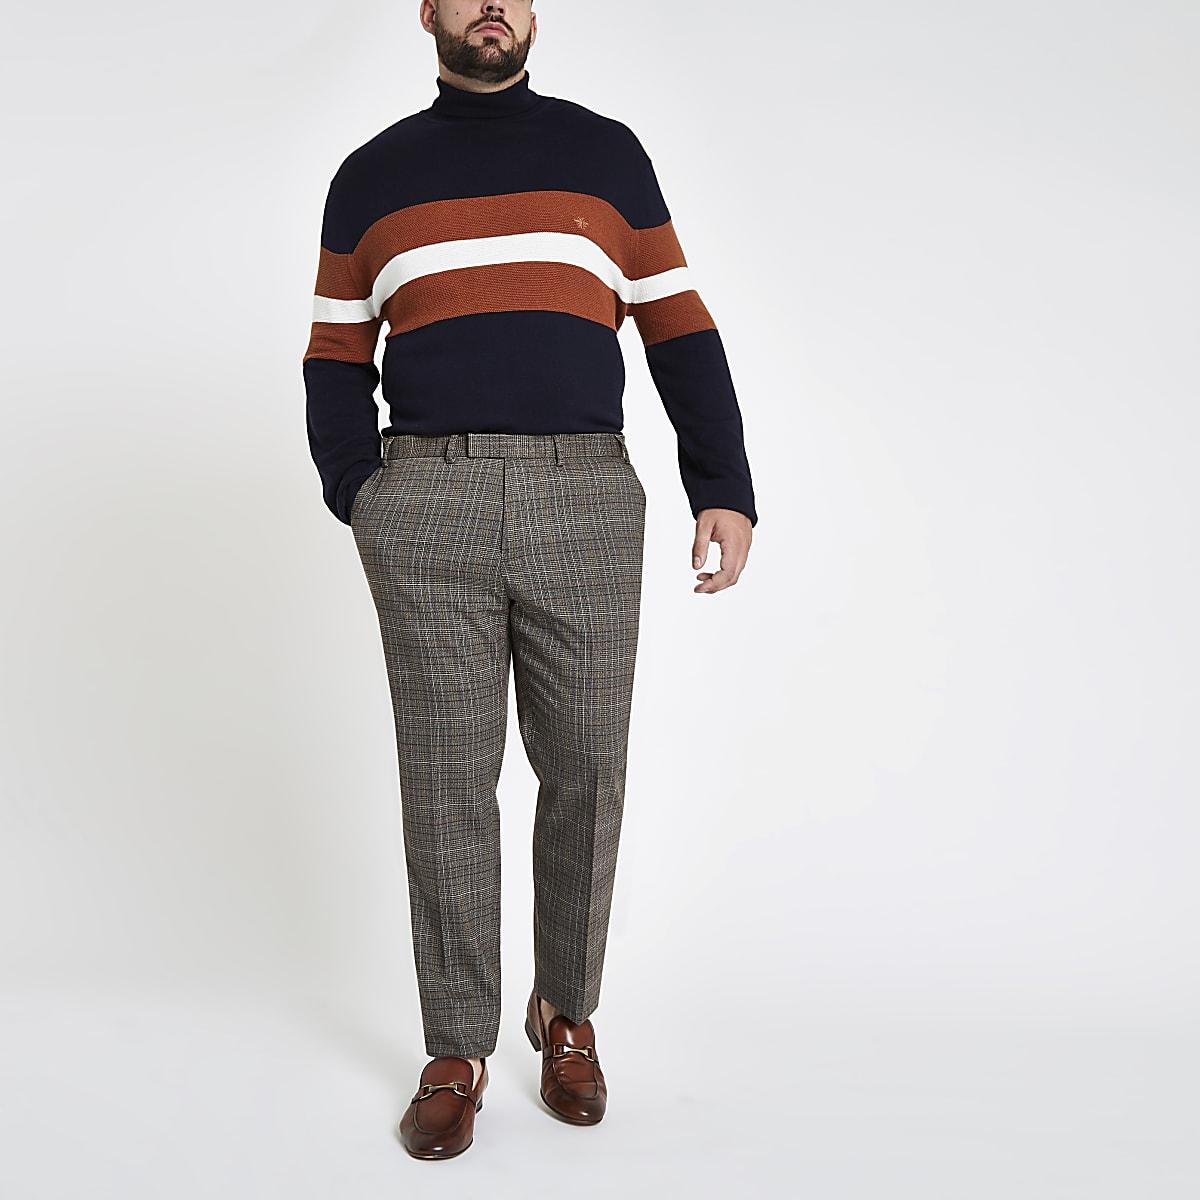 Big and Tall – Pantalon habillé skinny à carreaux gris